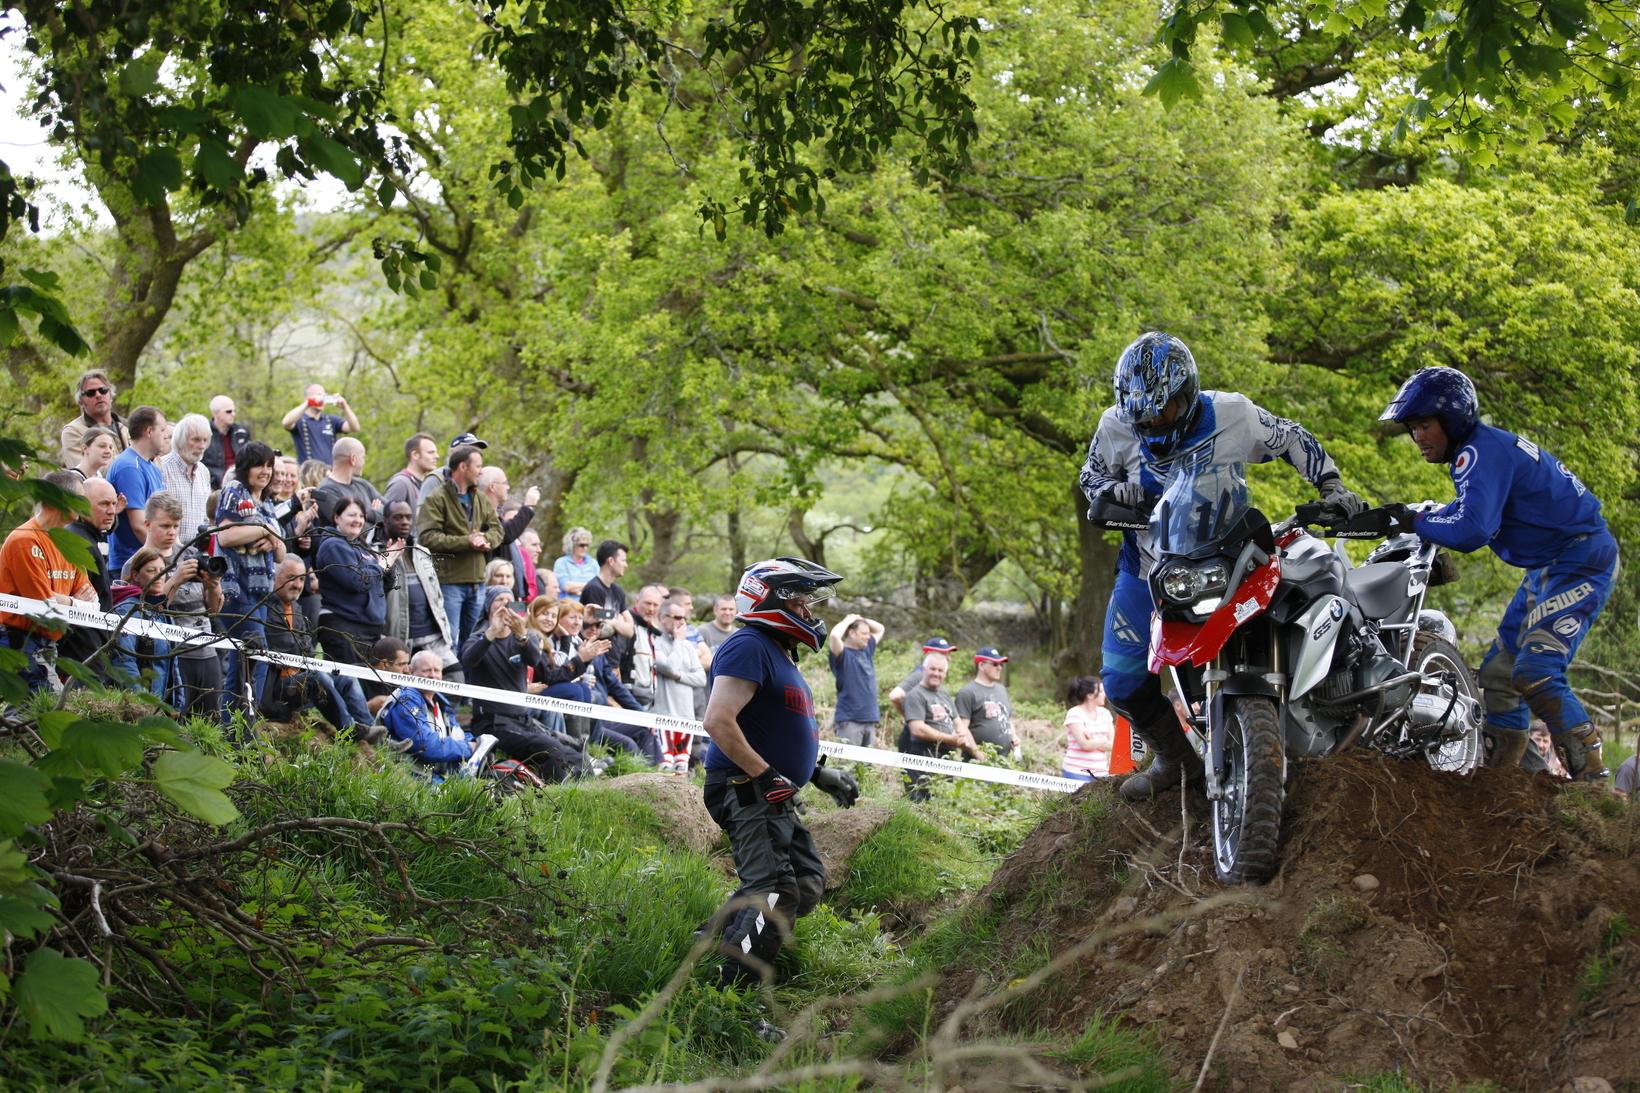 Introducing the BMW Motorrad UK GS Challenge